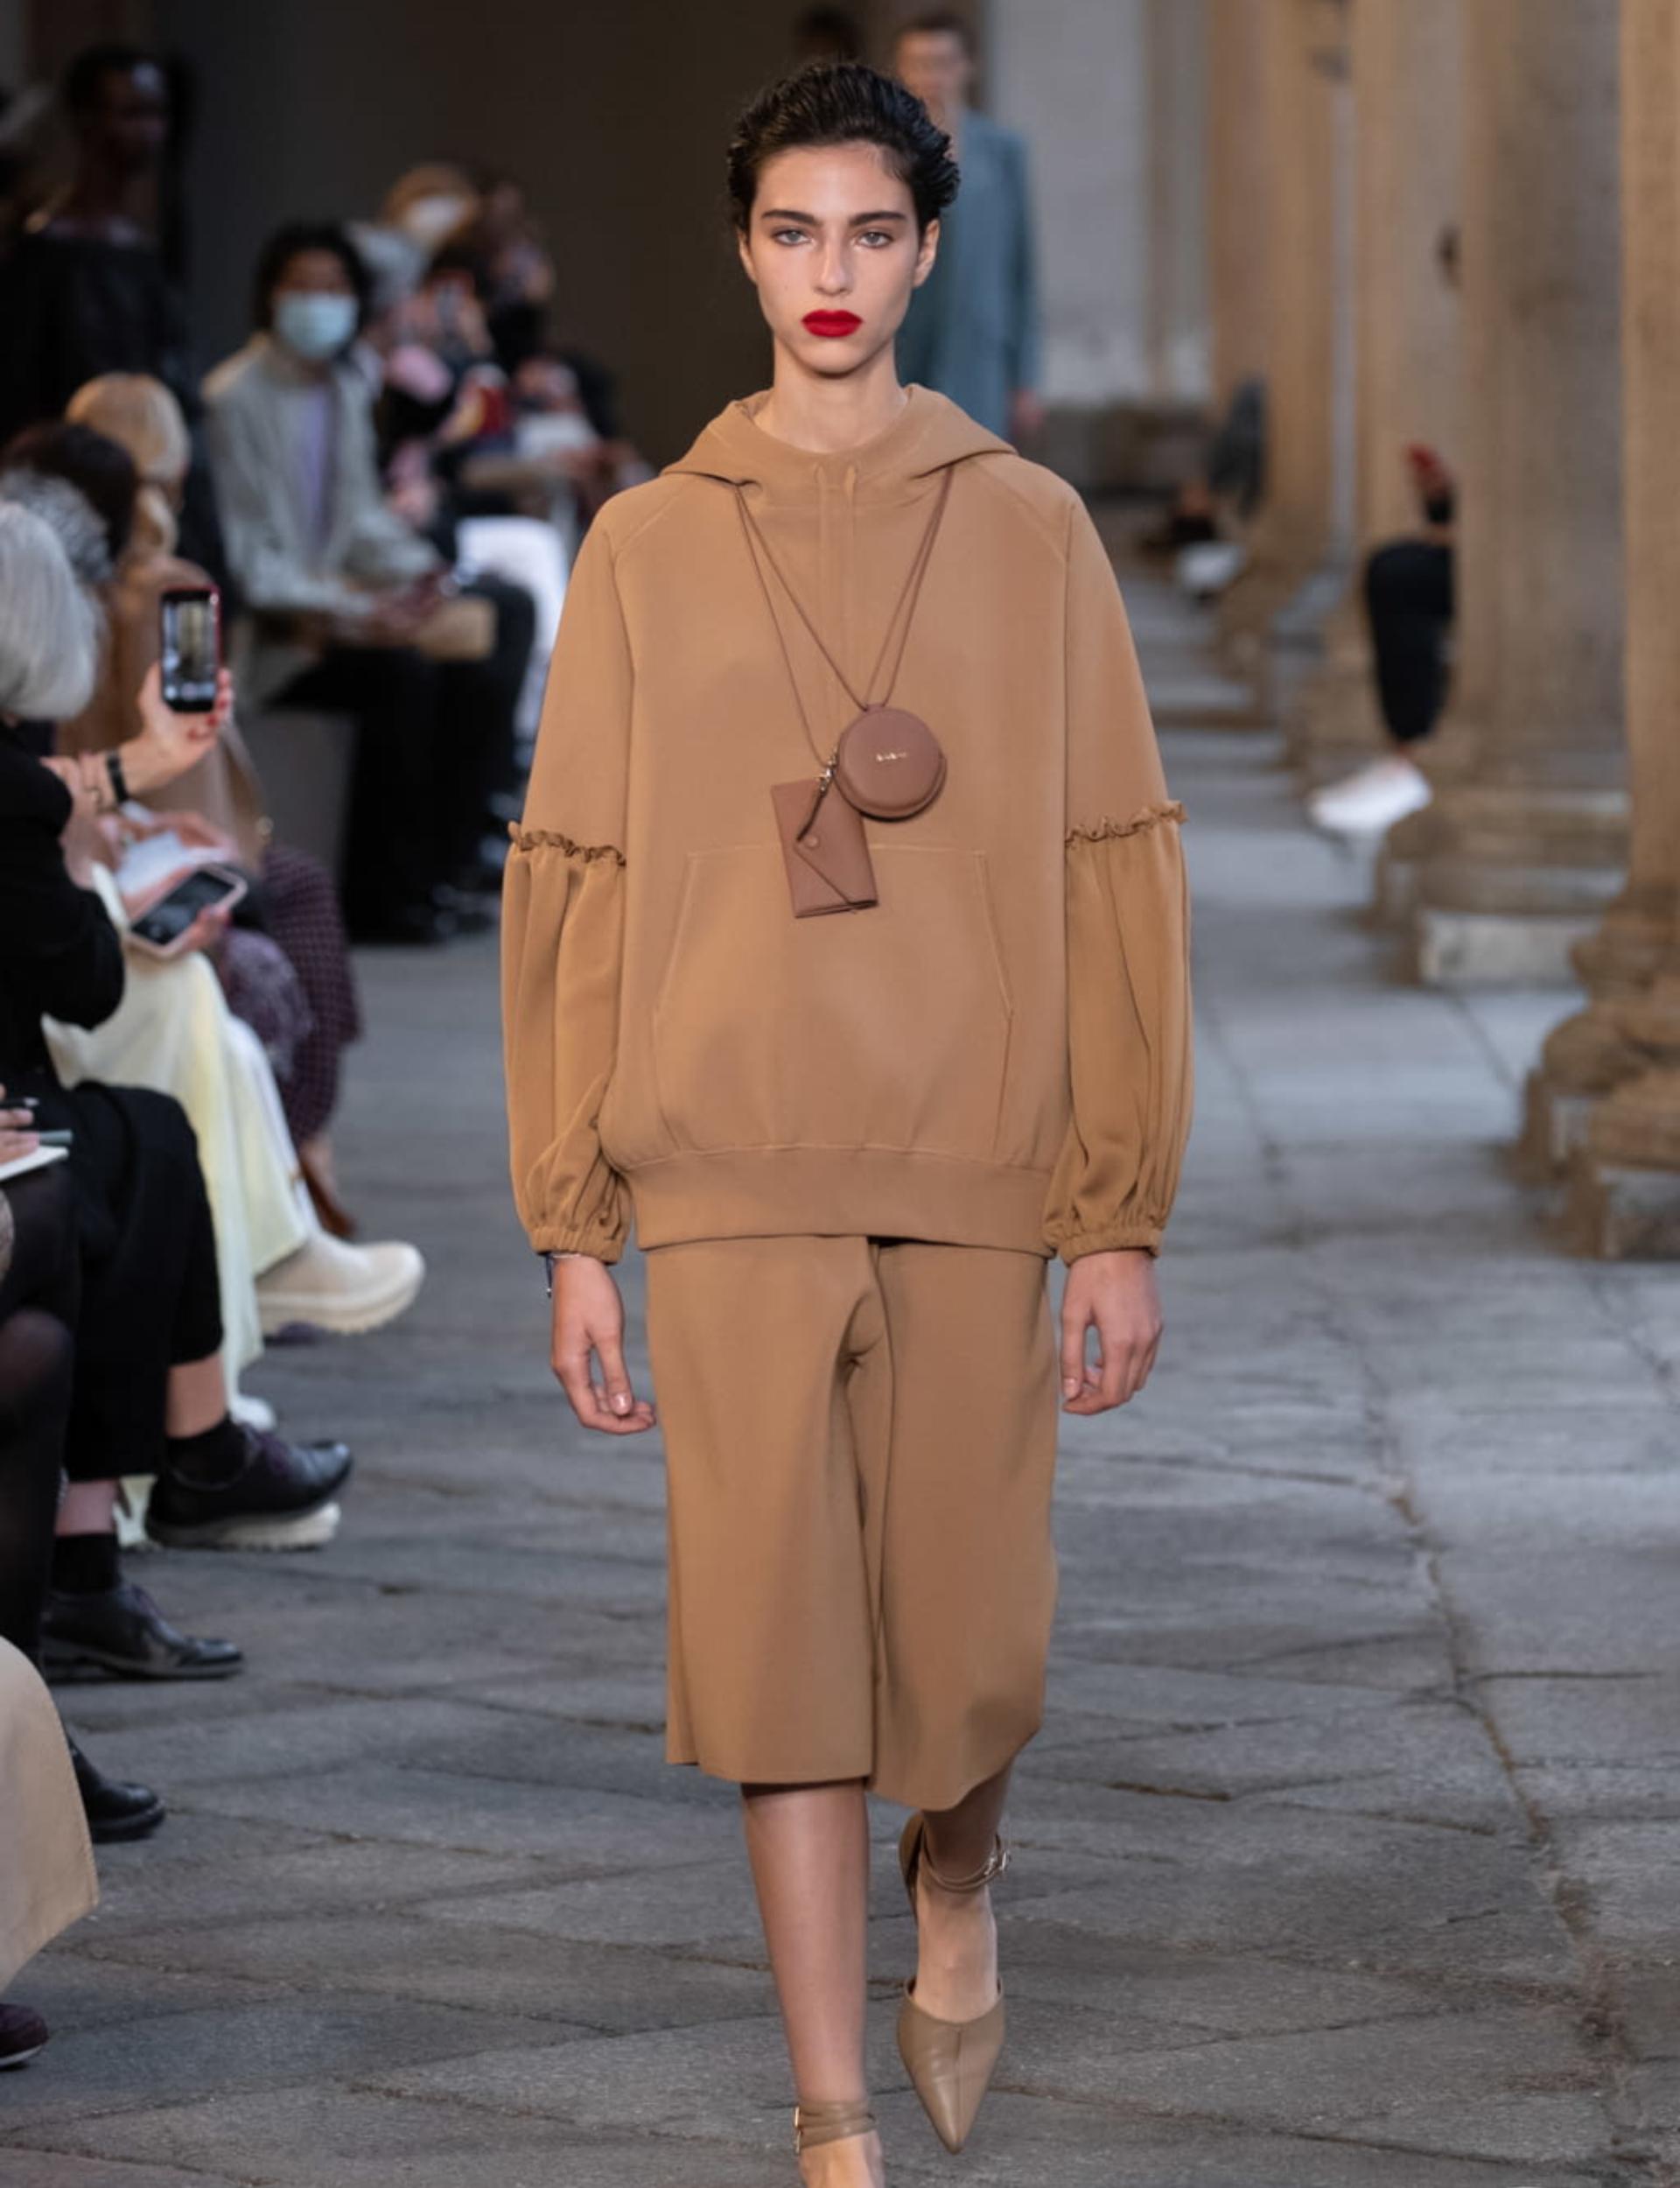 Loli Bahía, la modelo francesa del momento